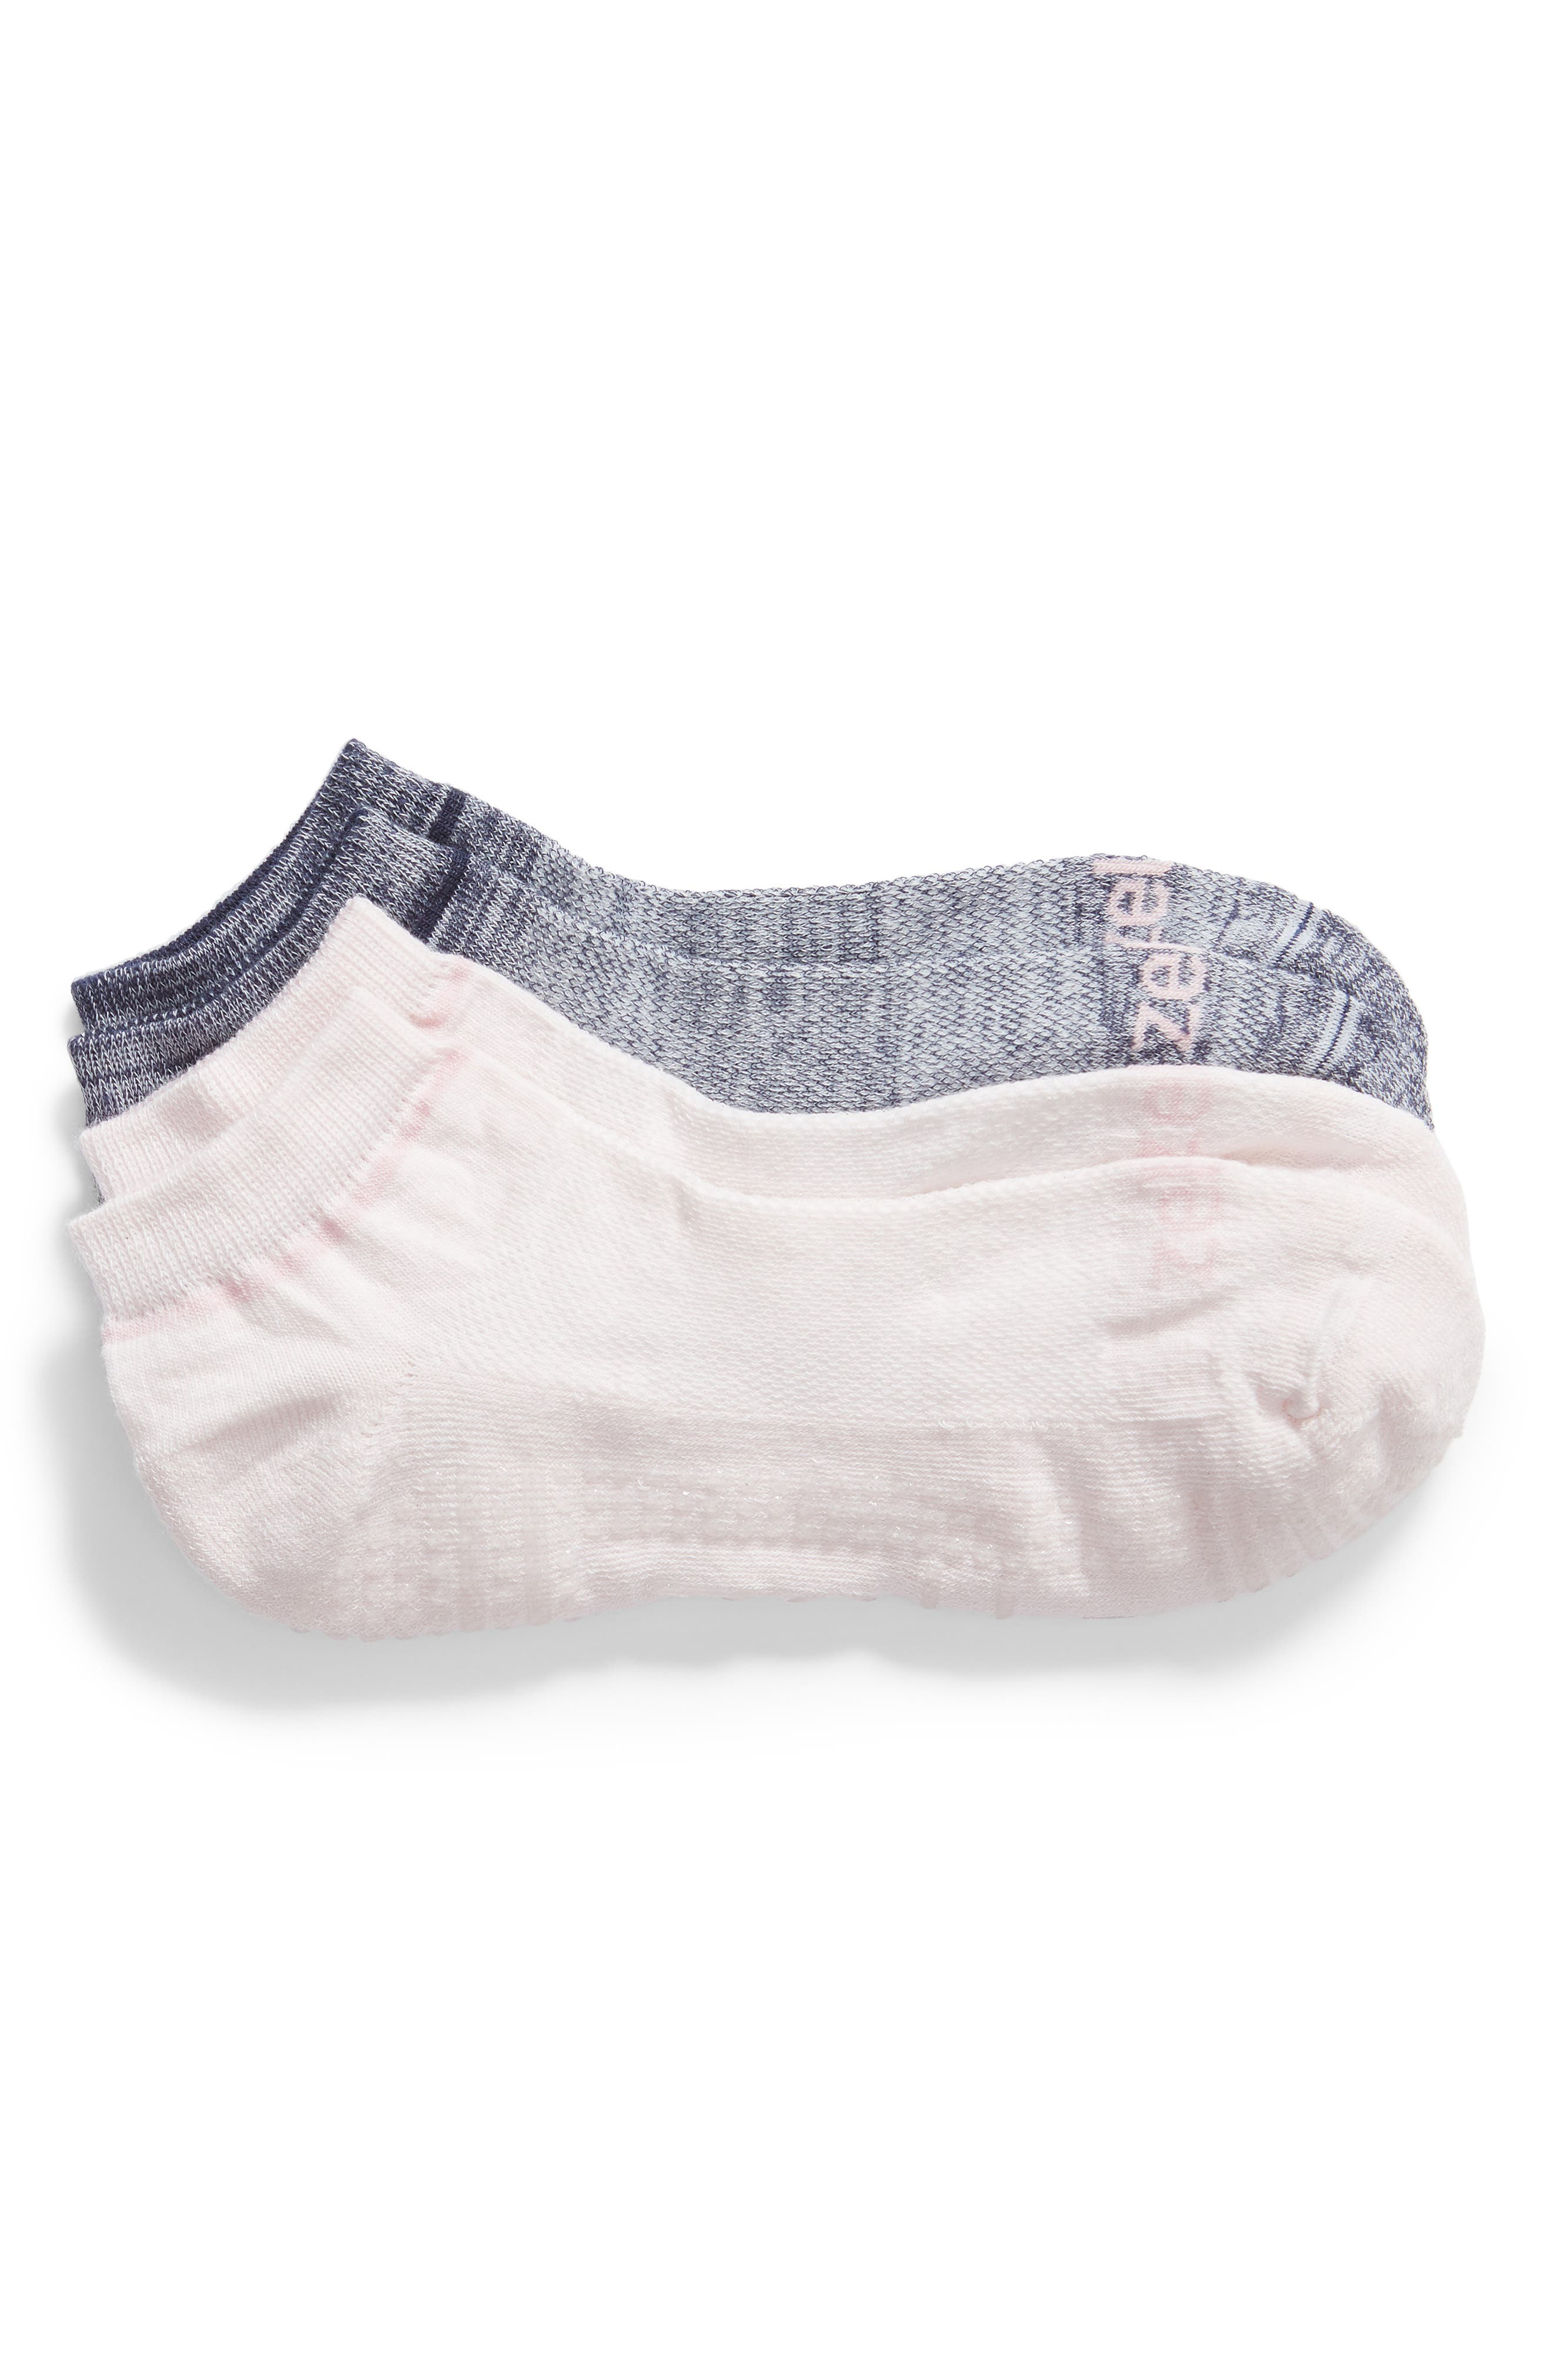 2-Pack Barre Socks,                             Main thumbnail 1, color,                             NAVY MARITIME